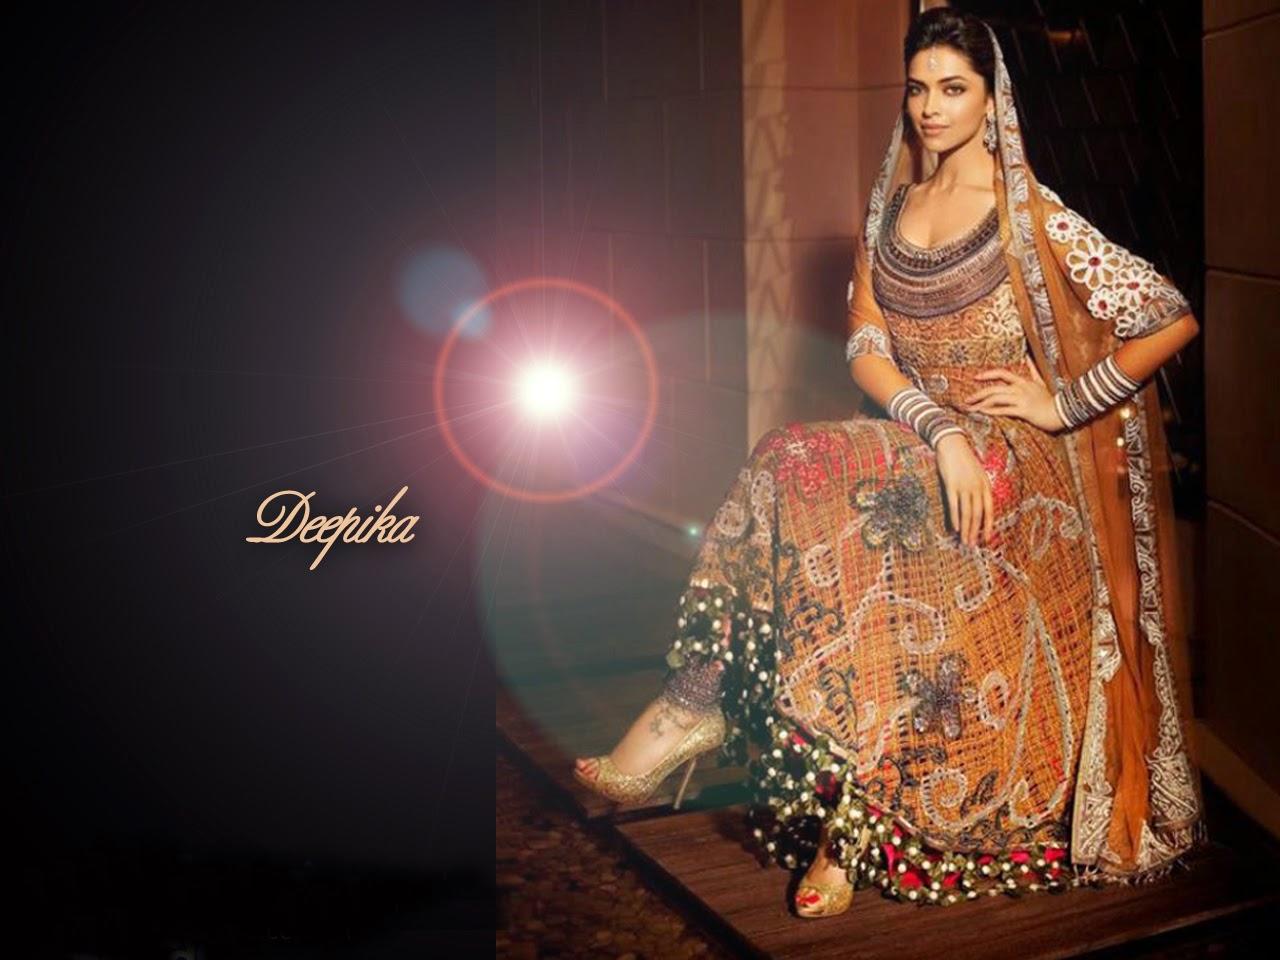 Global Pictures Gallery: Deepika Padukone Full HD Wallpapers